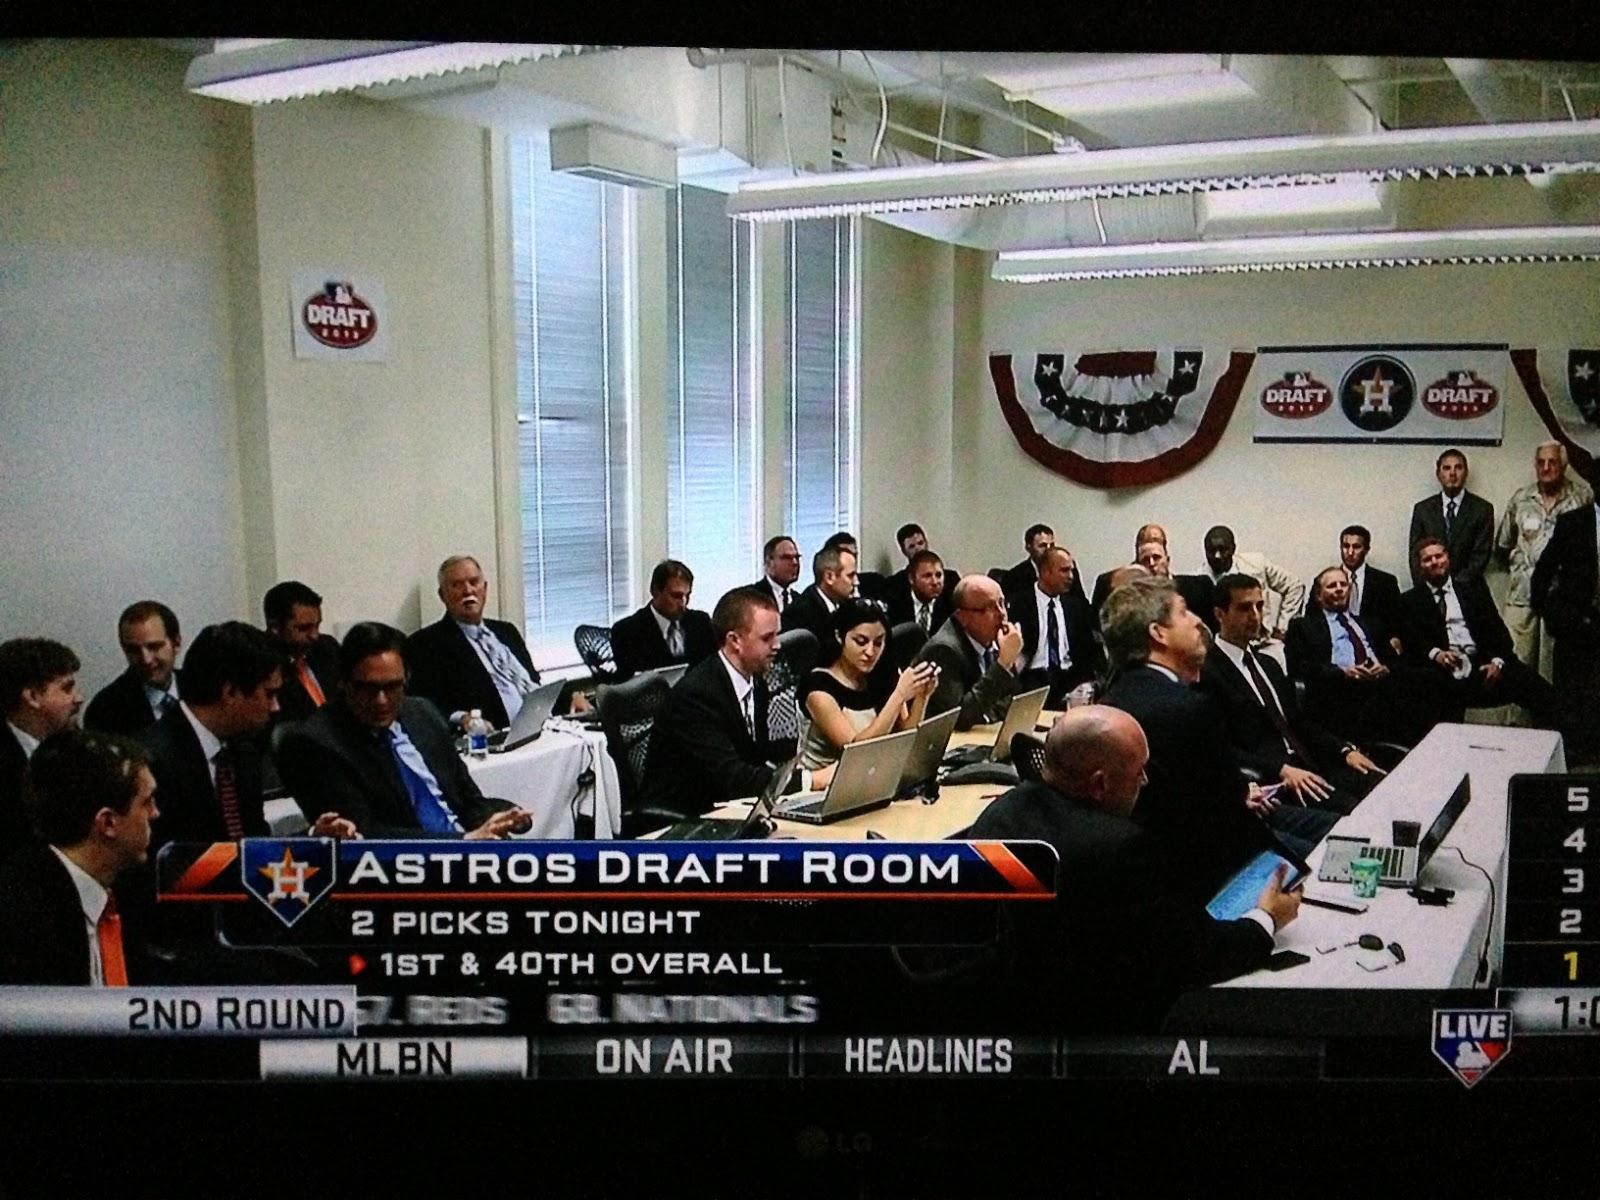 Get 'Em Young, Get 'Em Throwing: How Two Recent MLB Draft